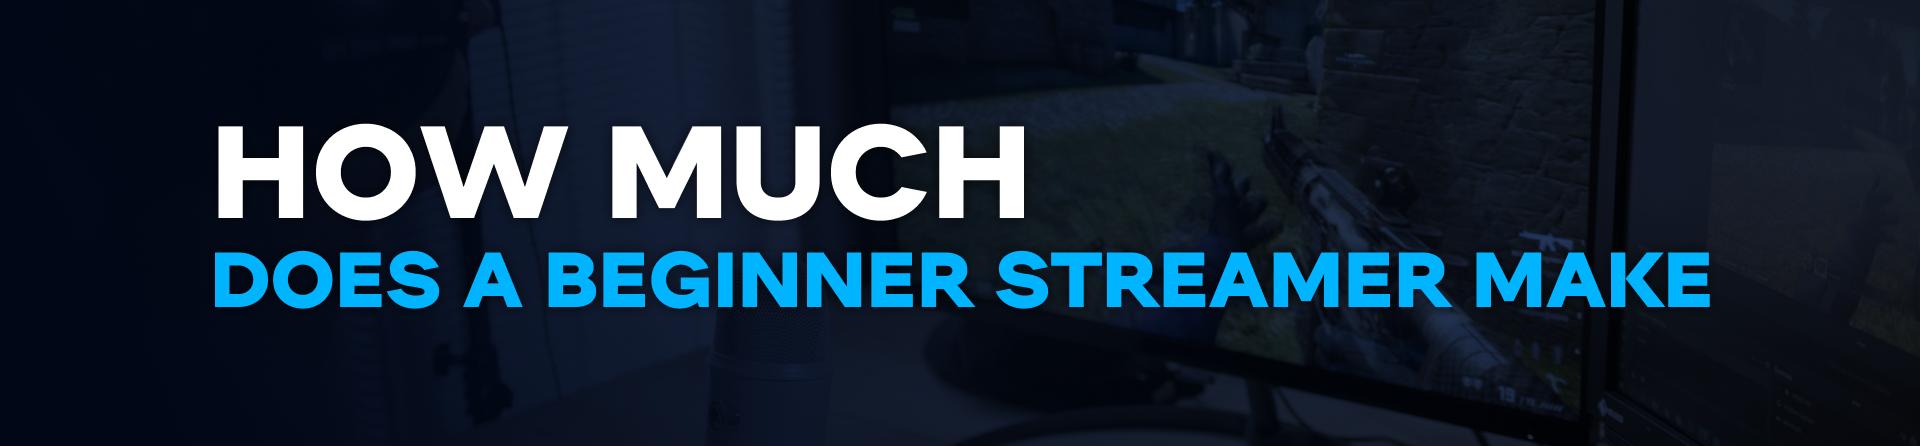 How much does a beginner streamer make?